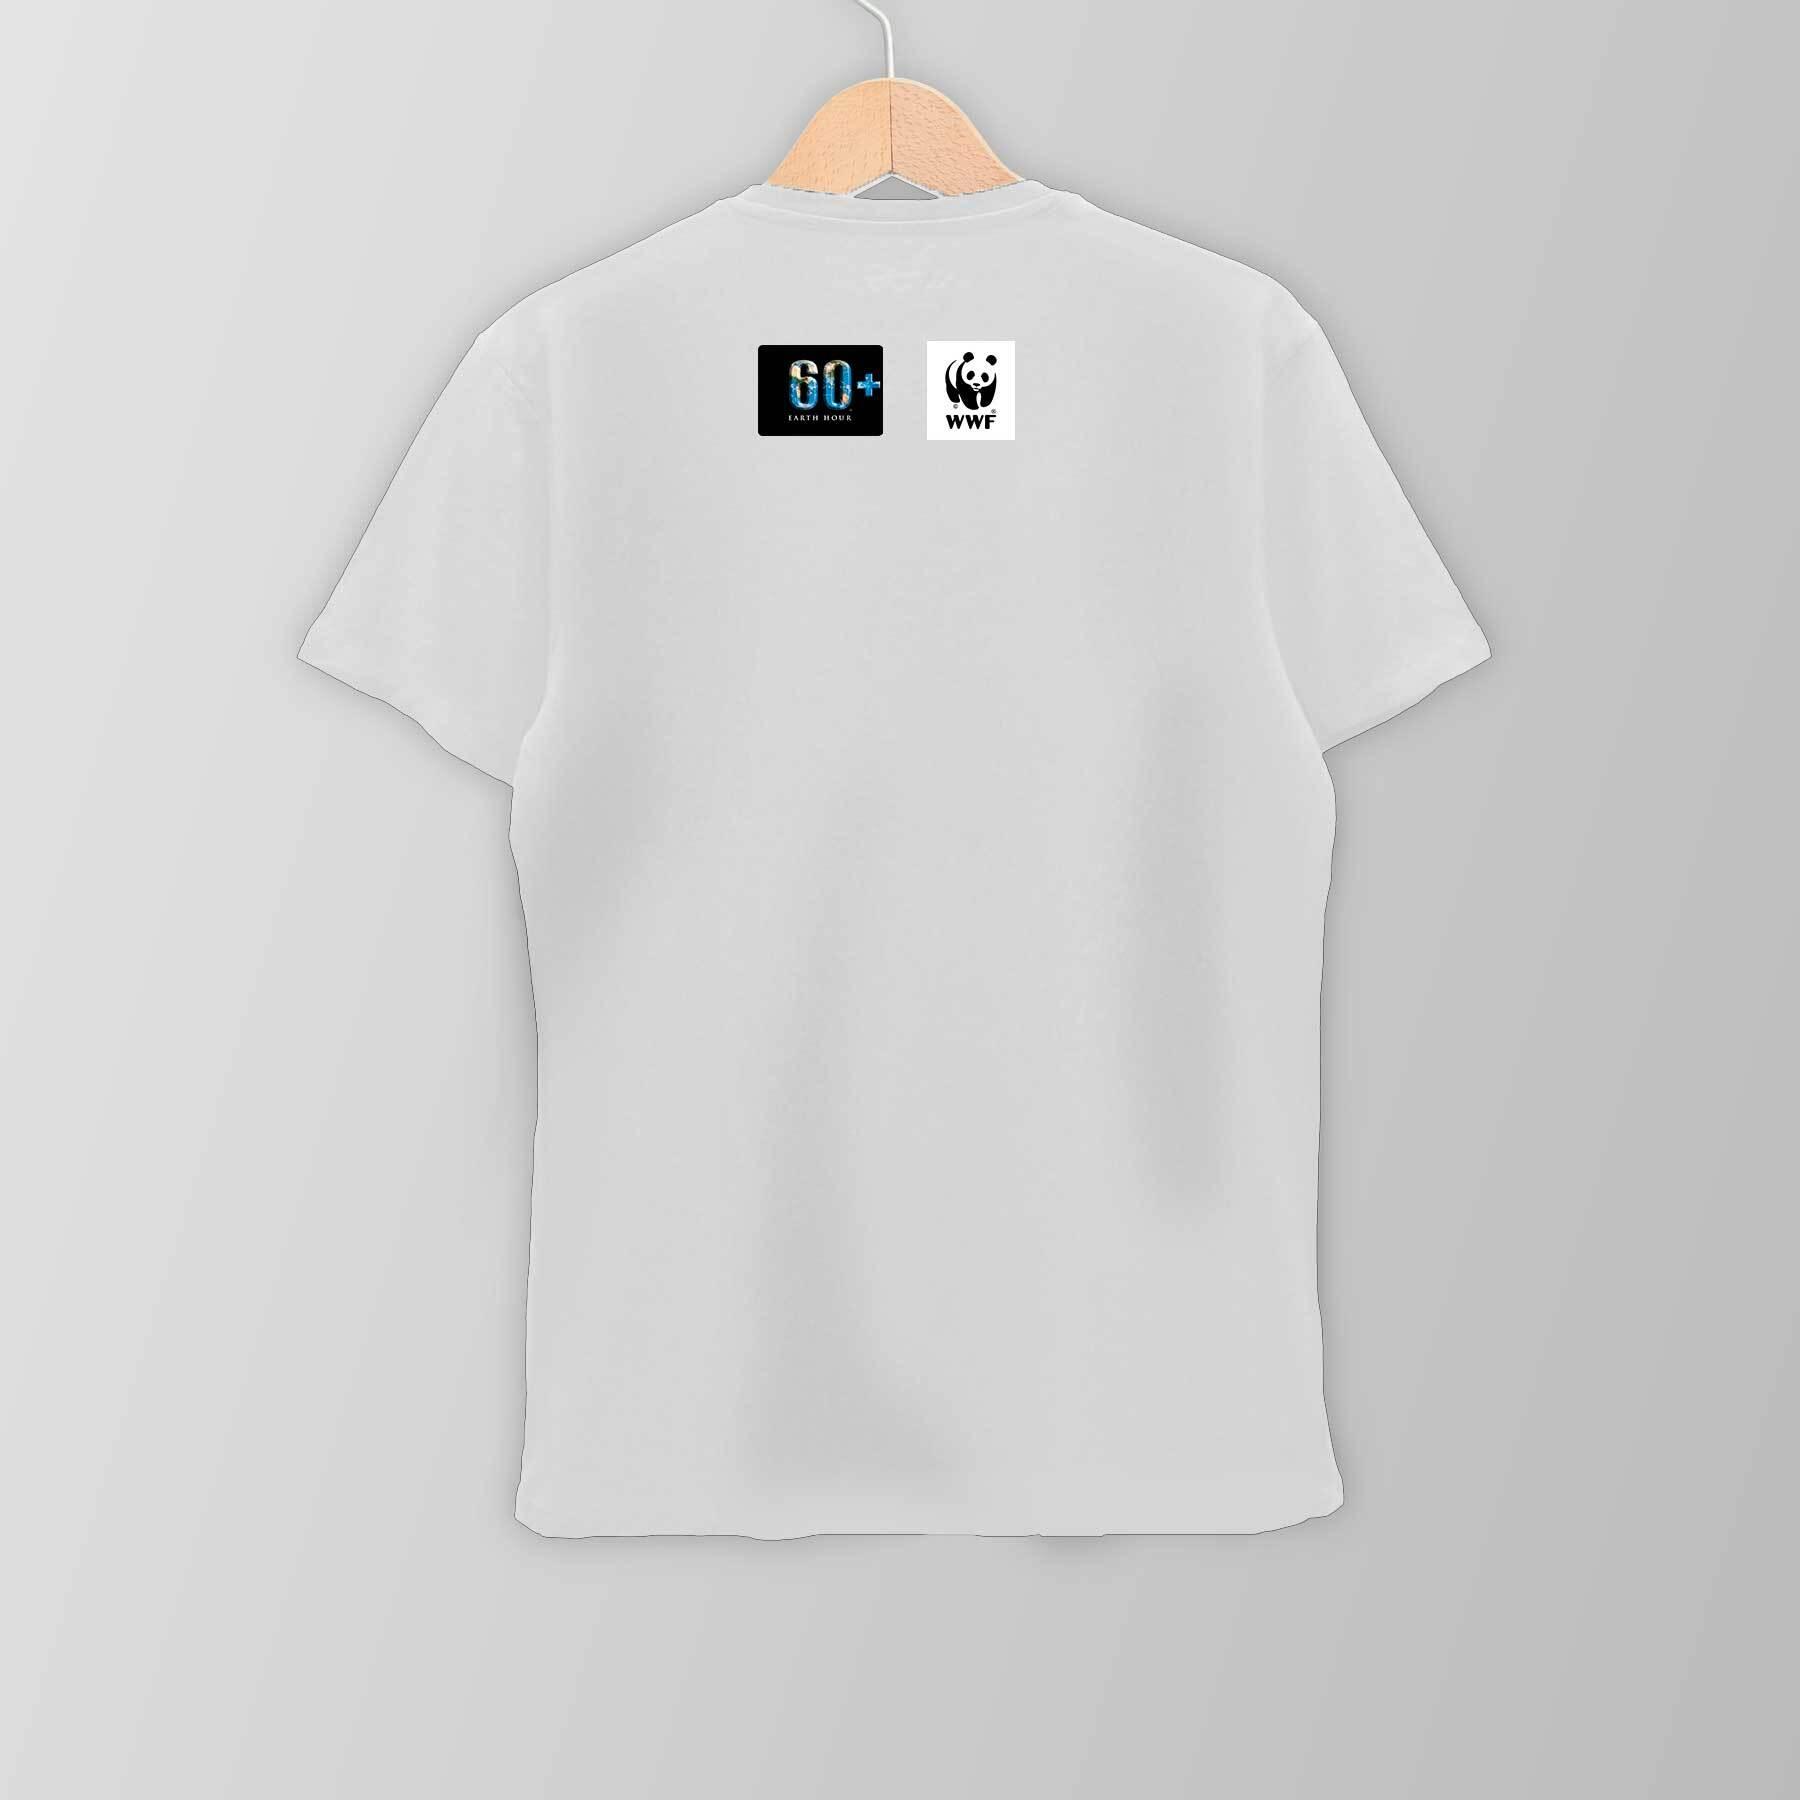 1EH2020-Shirt-Hashtag-Back-Mockup_WHITE